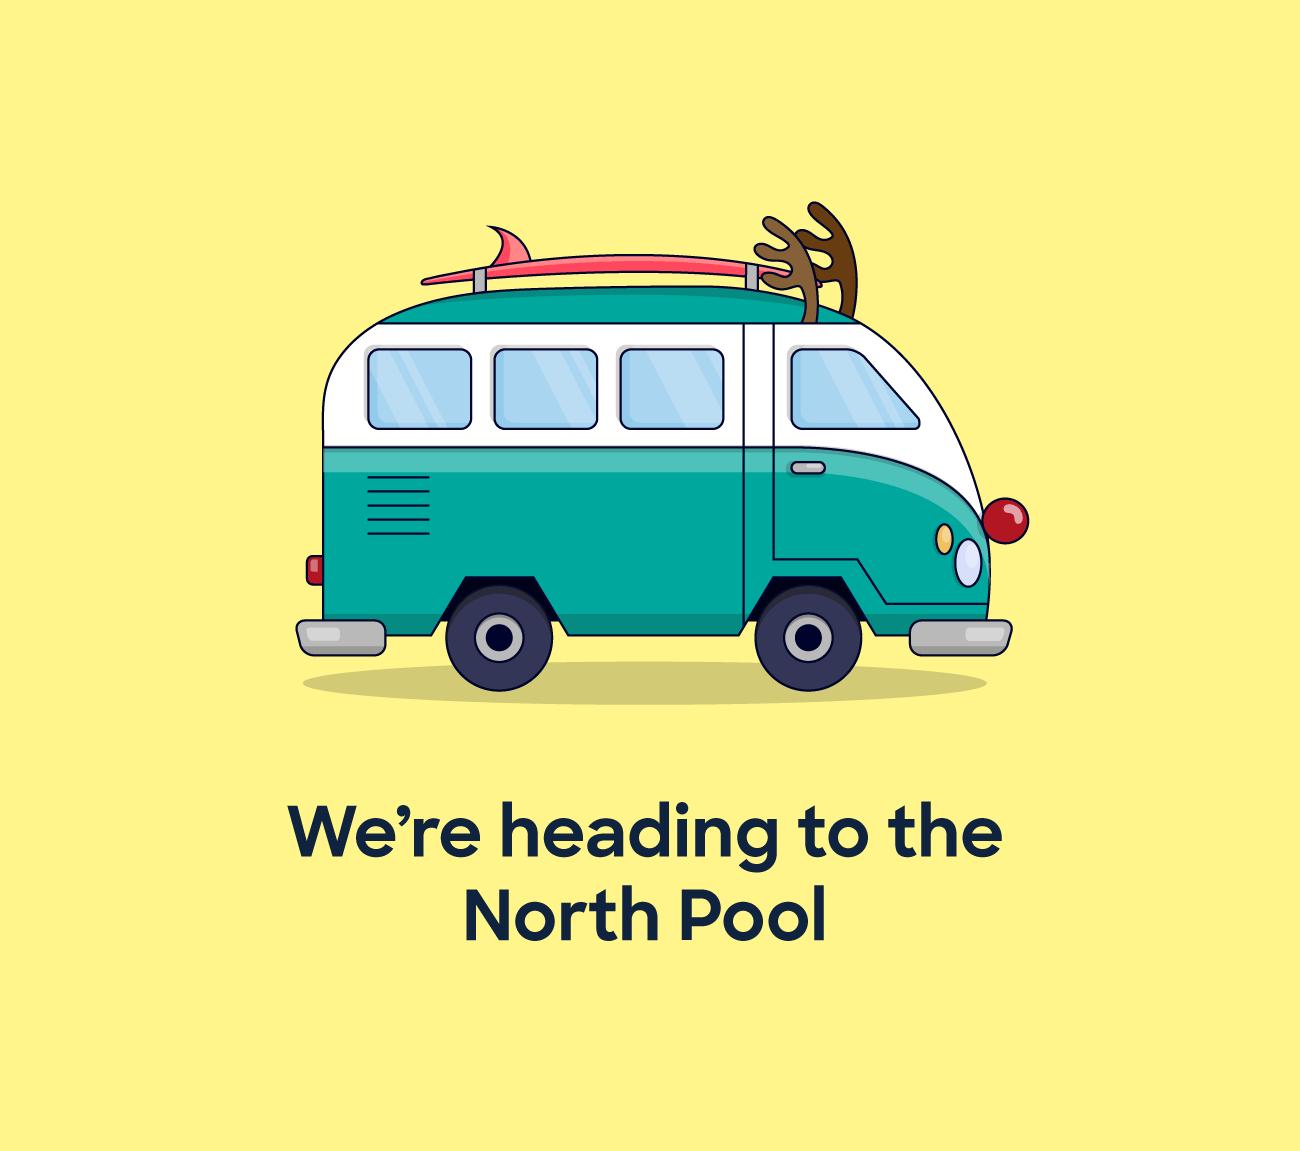 we're heading to the north pool in a combi van with reindeer antlers